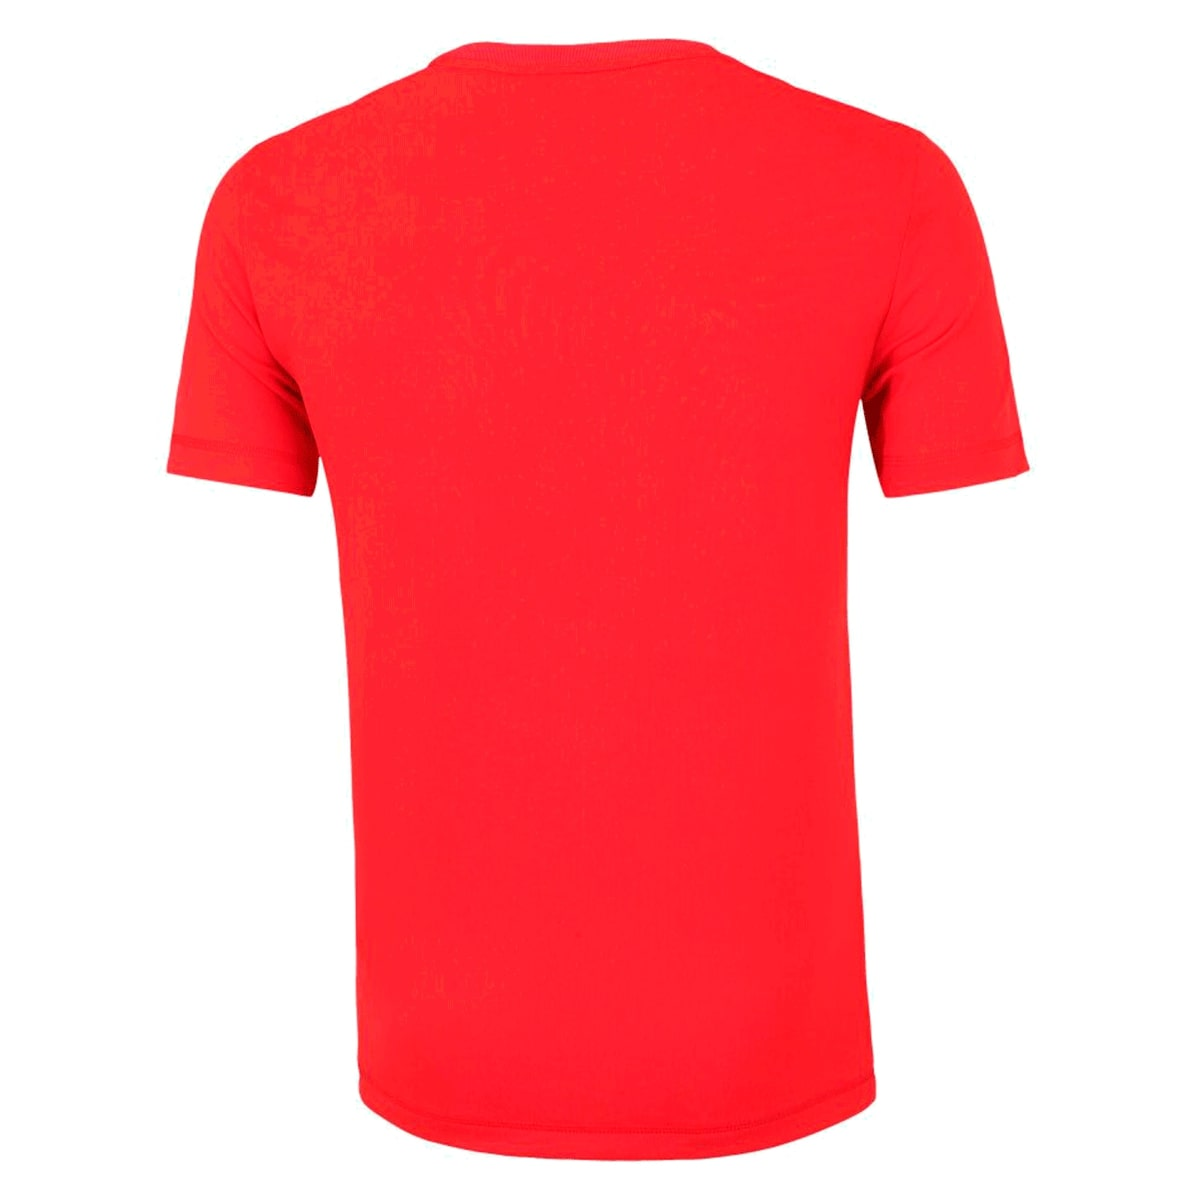 Camiseta Puma Active Tee Masculino Vermelho